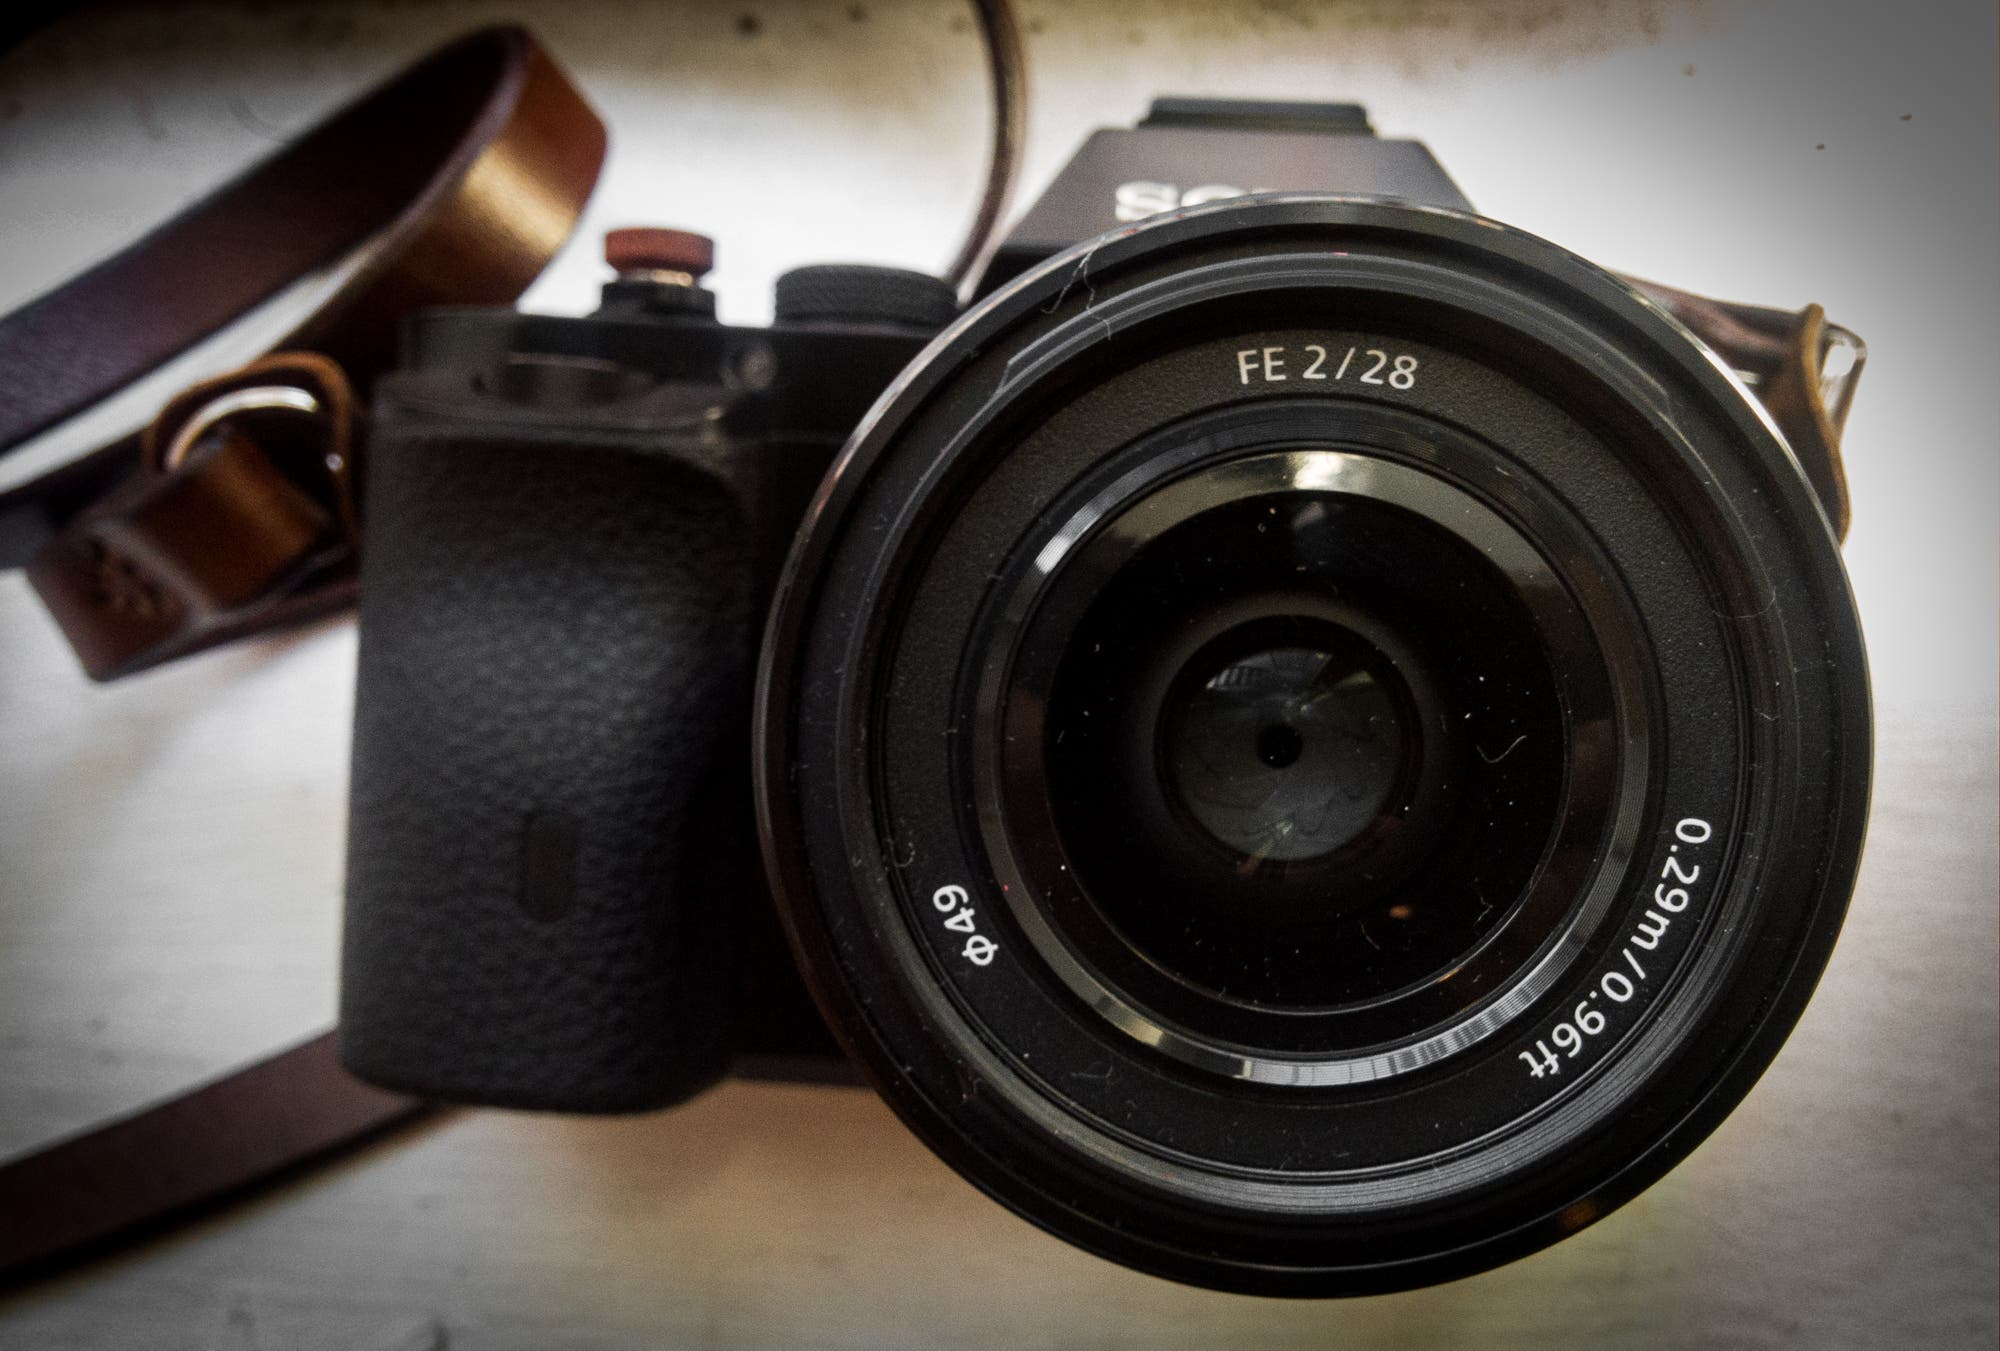 Will We See a Sony 28mm F1.8 Lens This Year? Or a G Master?